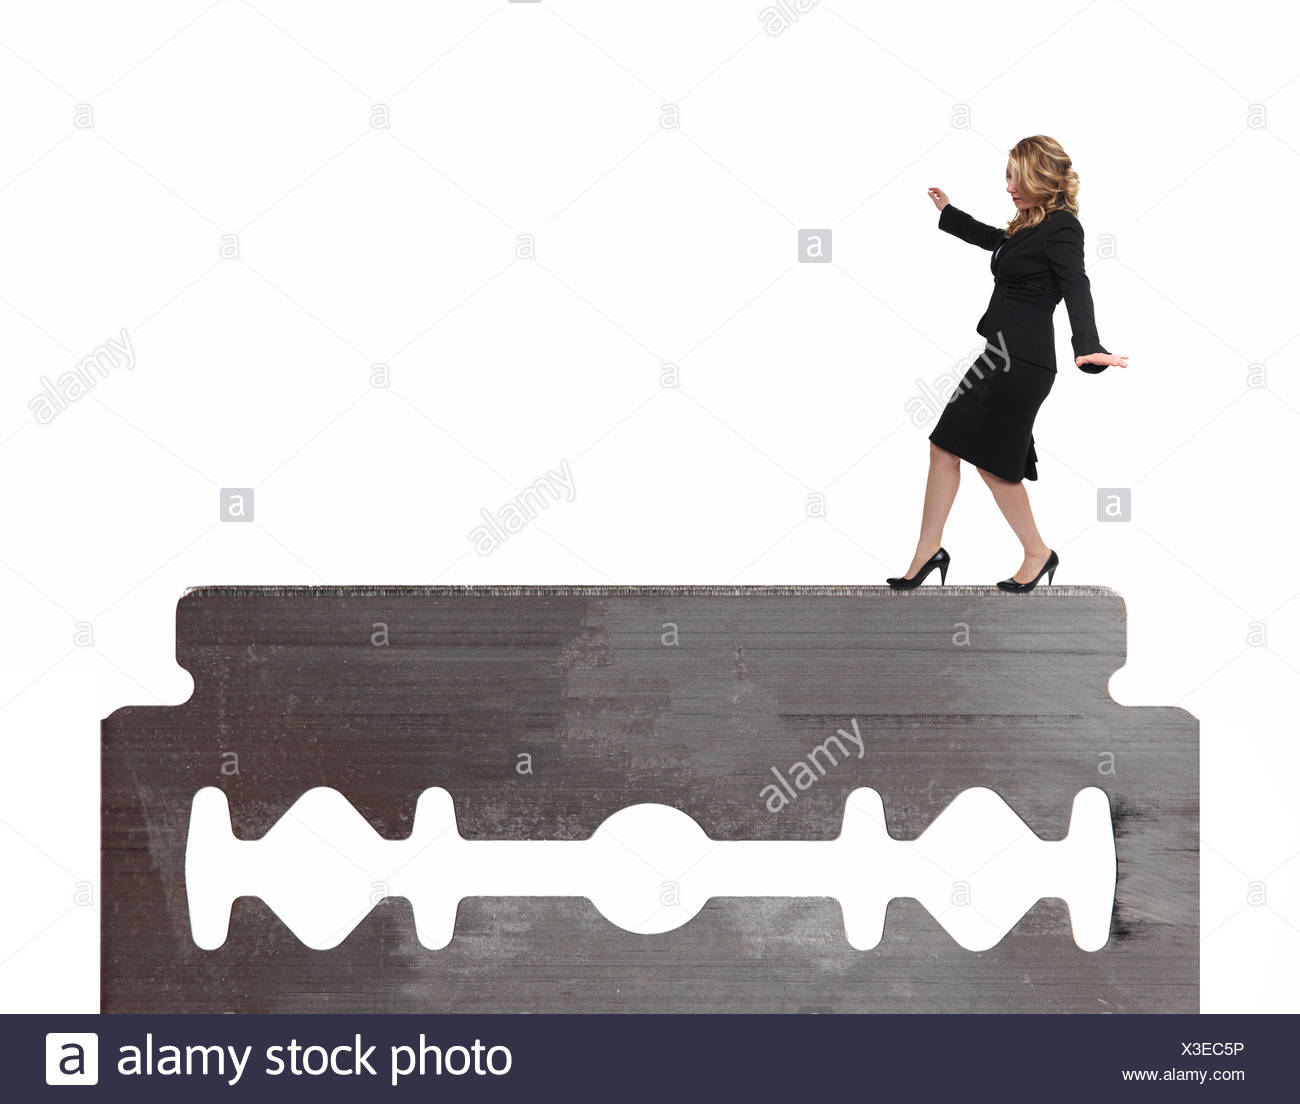 woman on blade - Stock Image